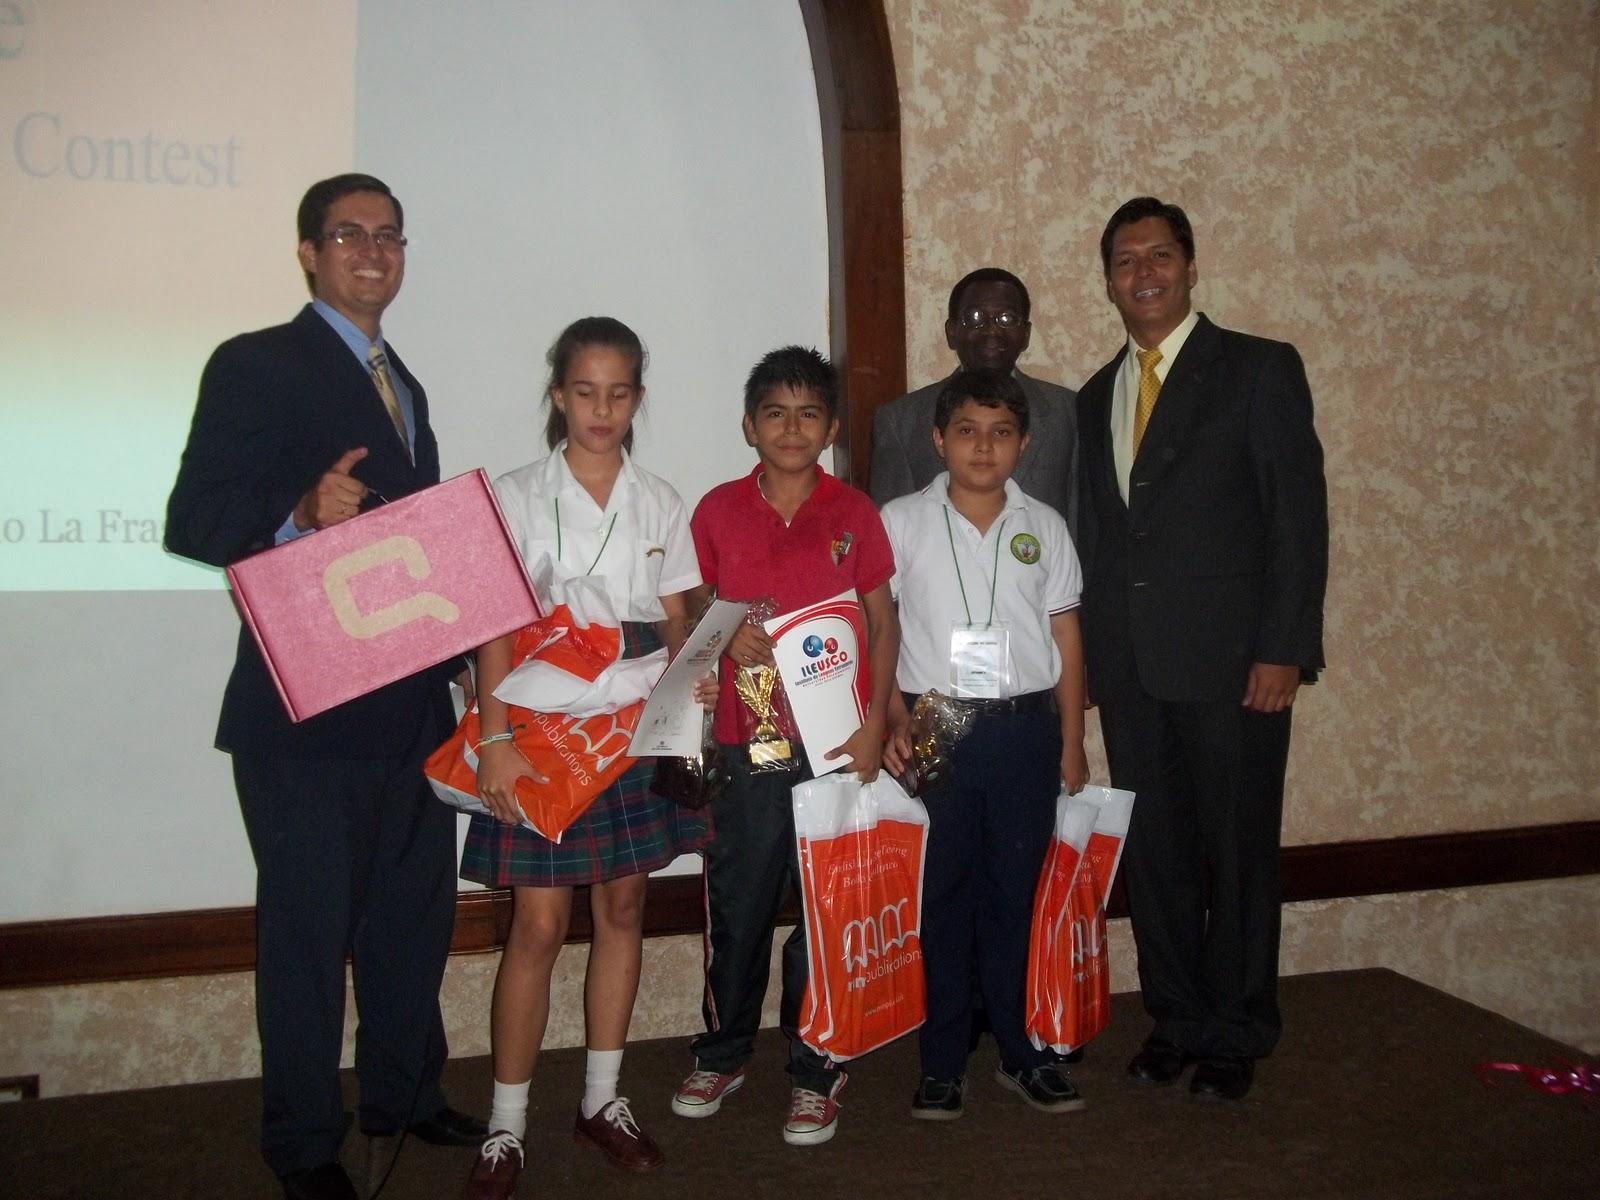 Coordination of bilingualism for Gimnasio winner